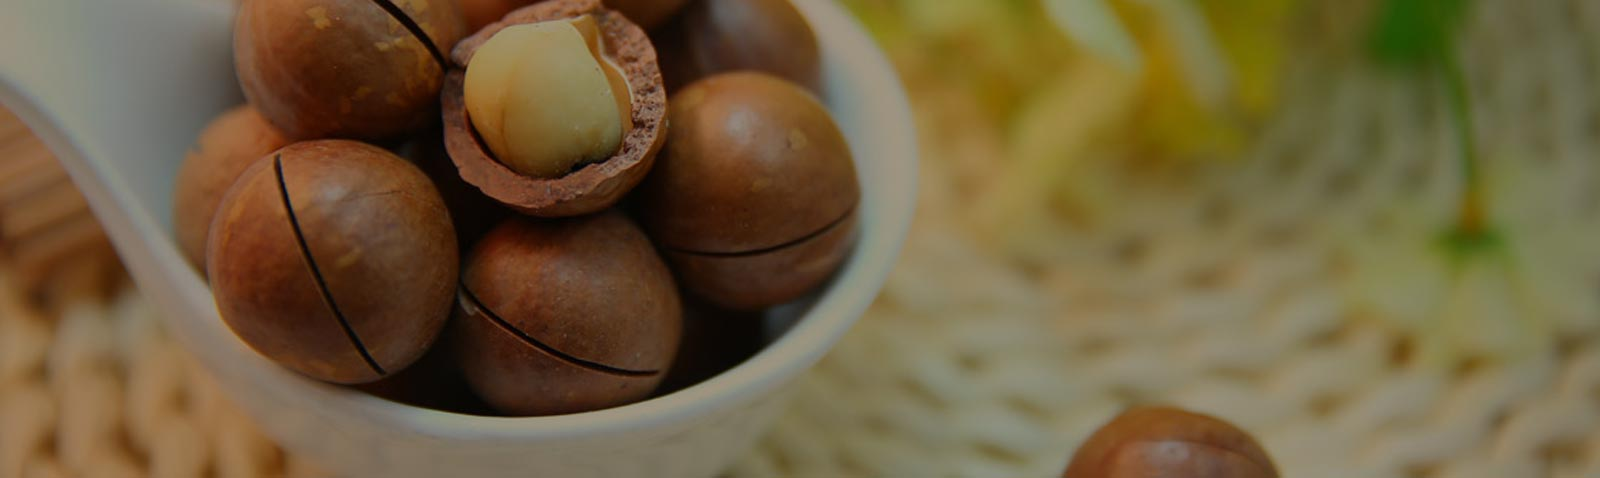 Macadamia Abbildung